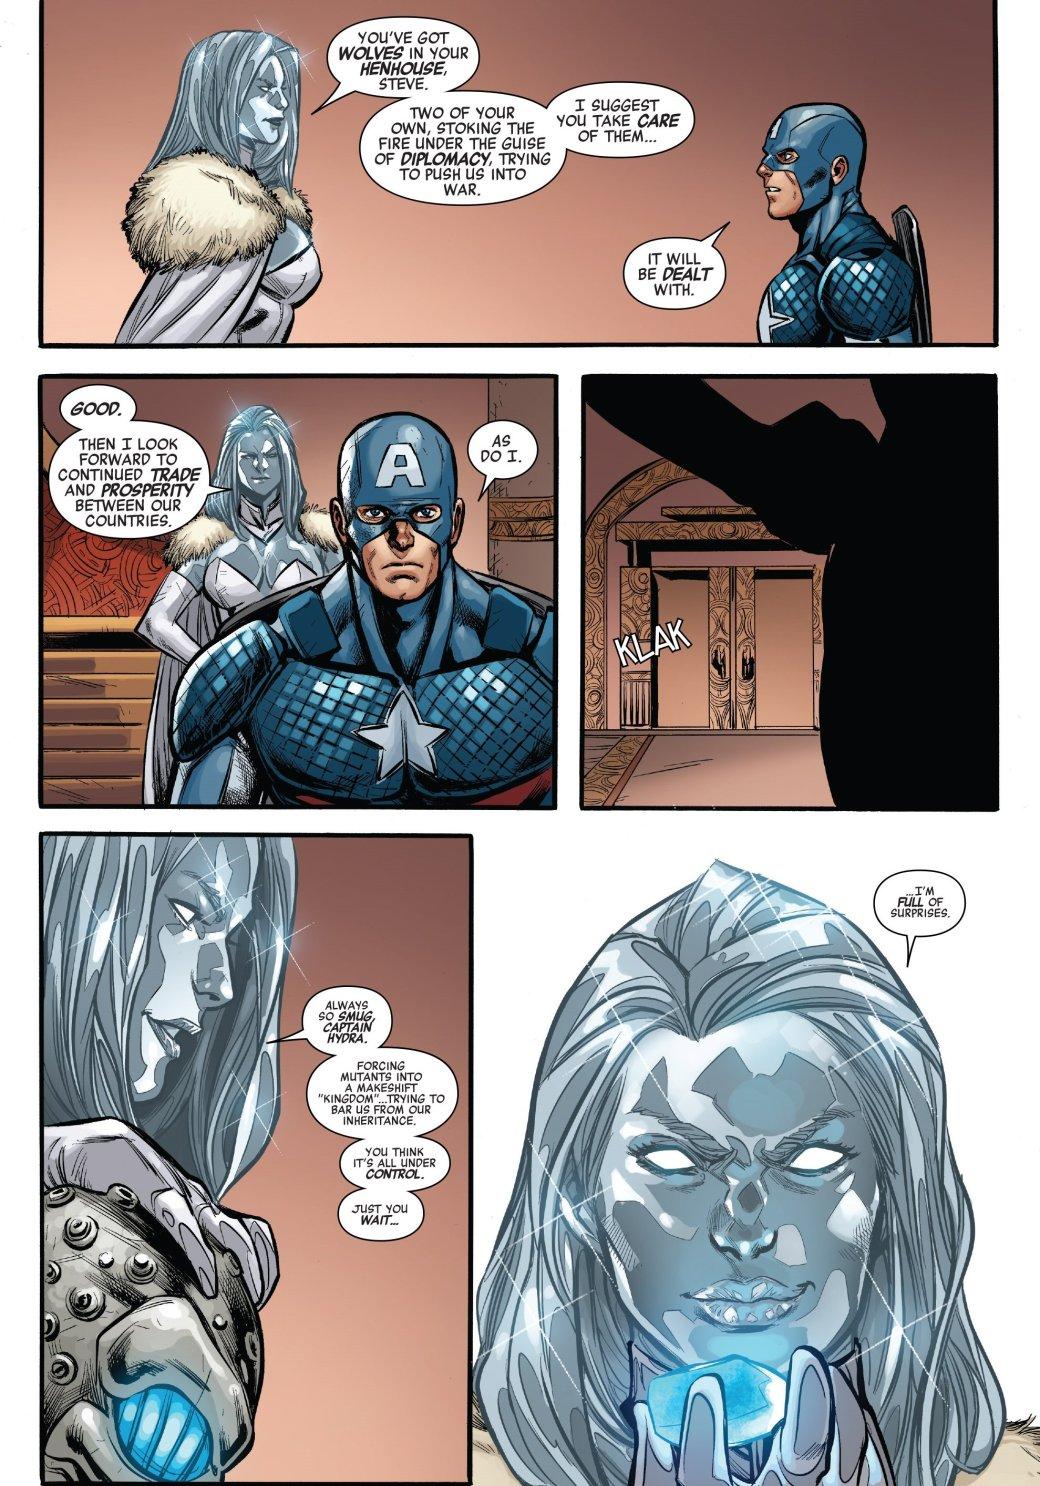 Secret Empire: противостоянию Стива Роджерса иТони Старка нет конца - Изображение 10